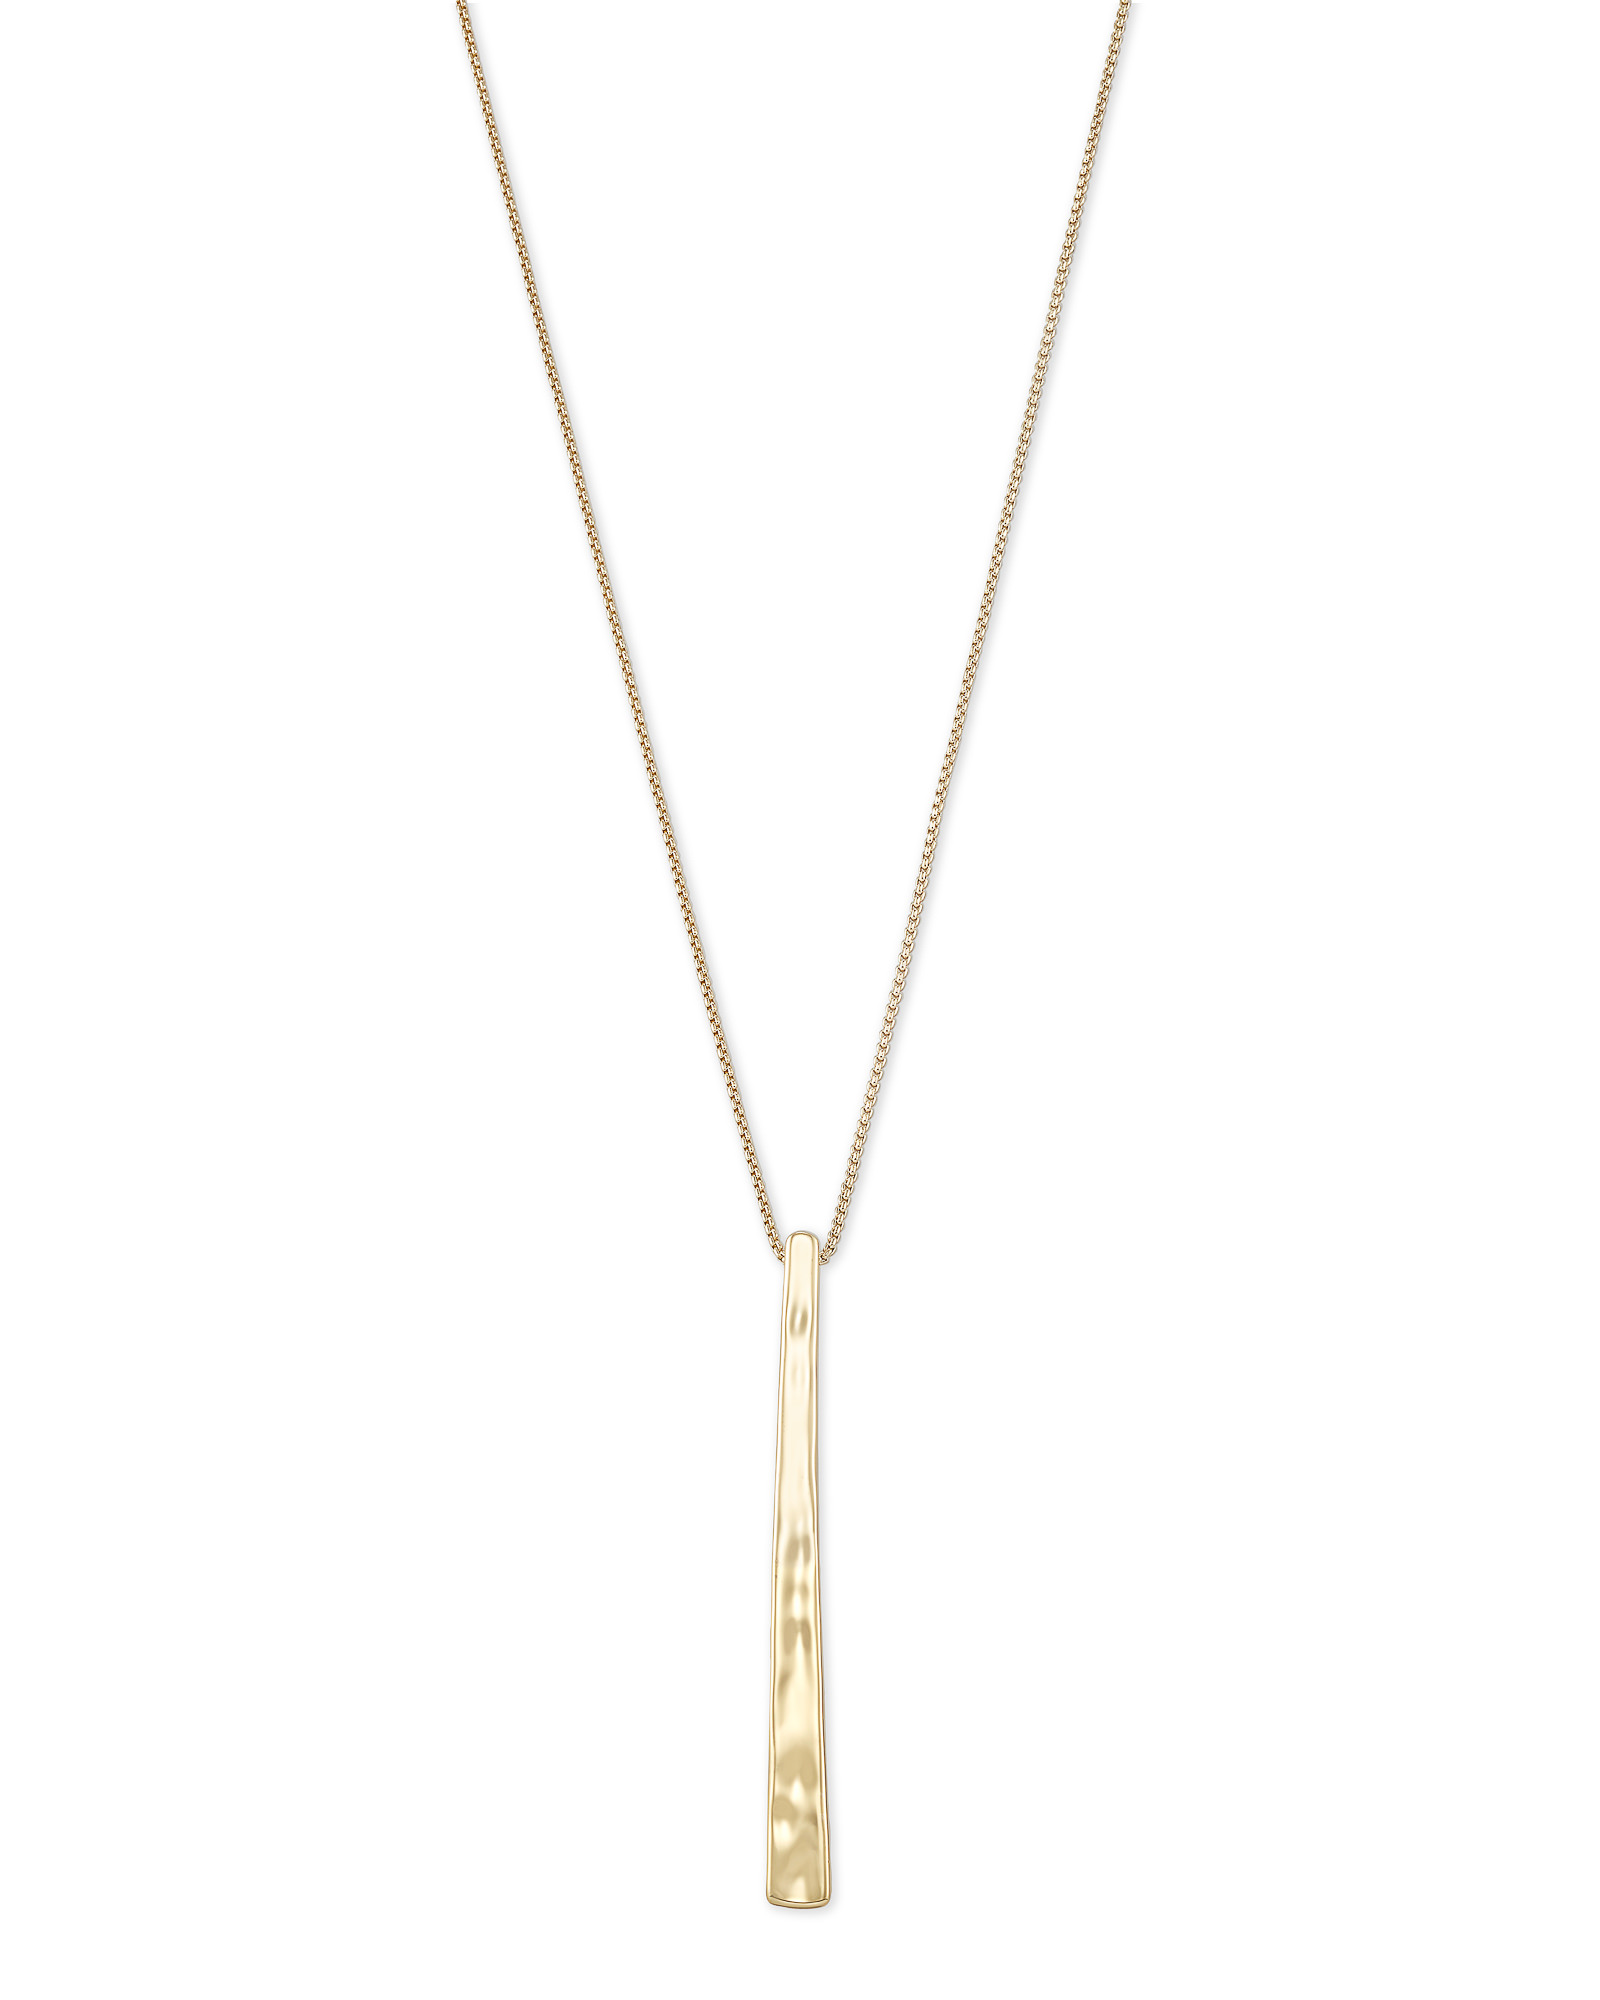 kendra-scott-baleigh-long-pendant-necklace-gold-00-lg